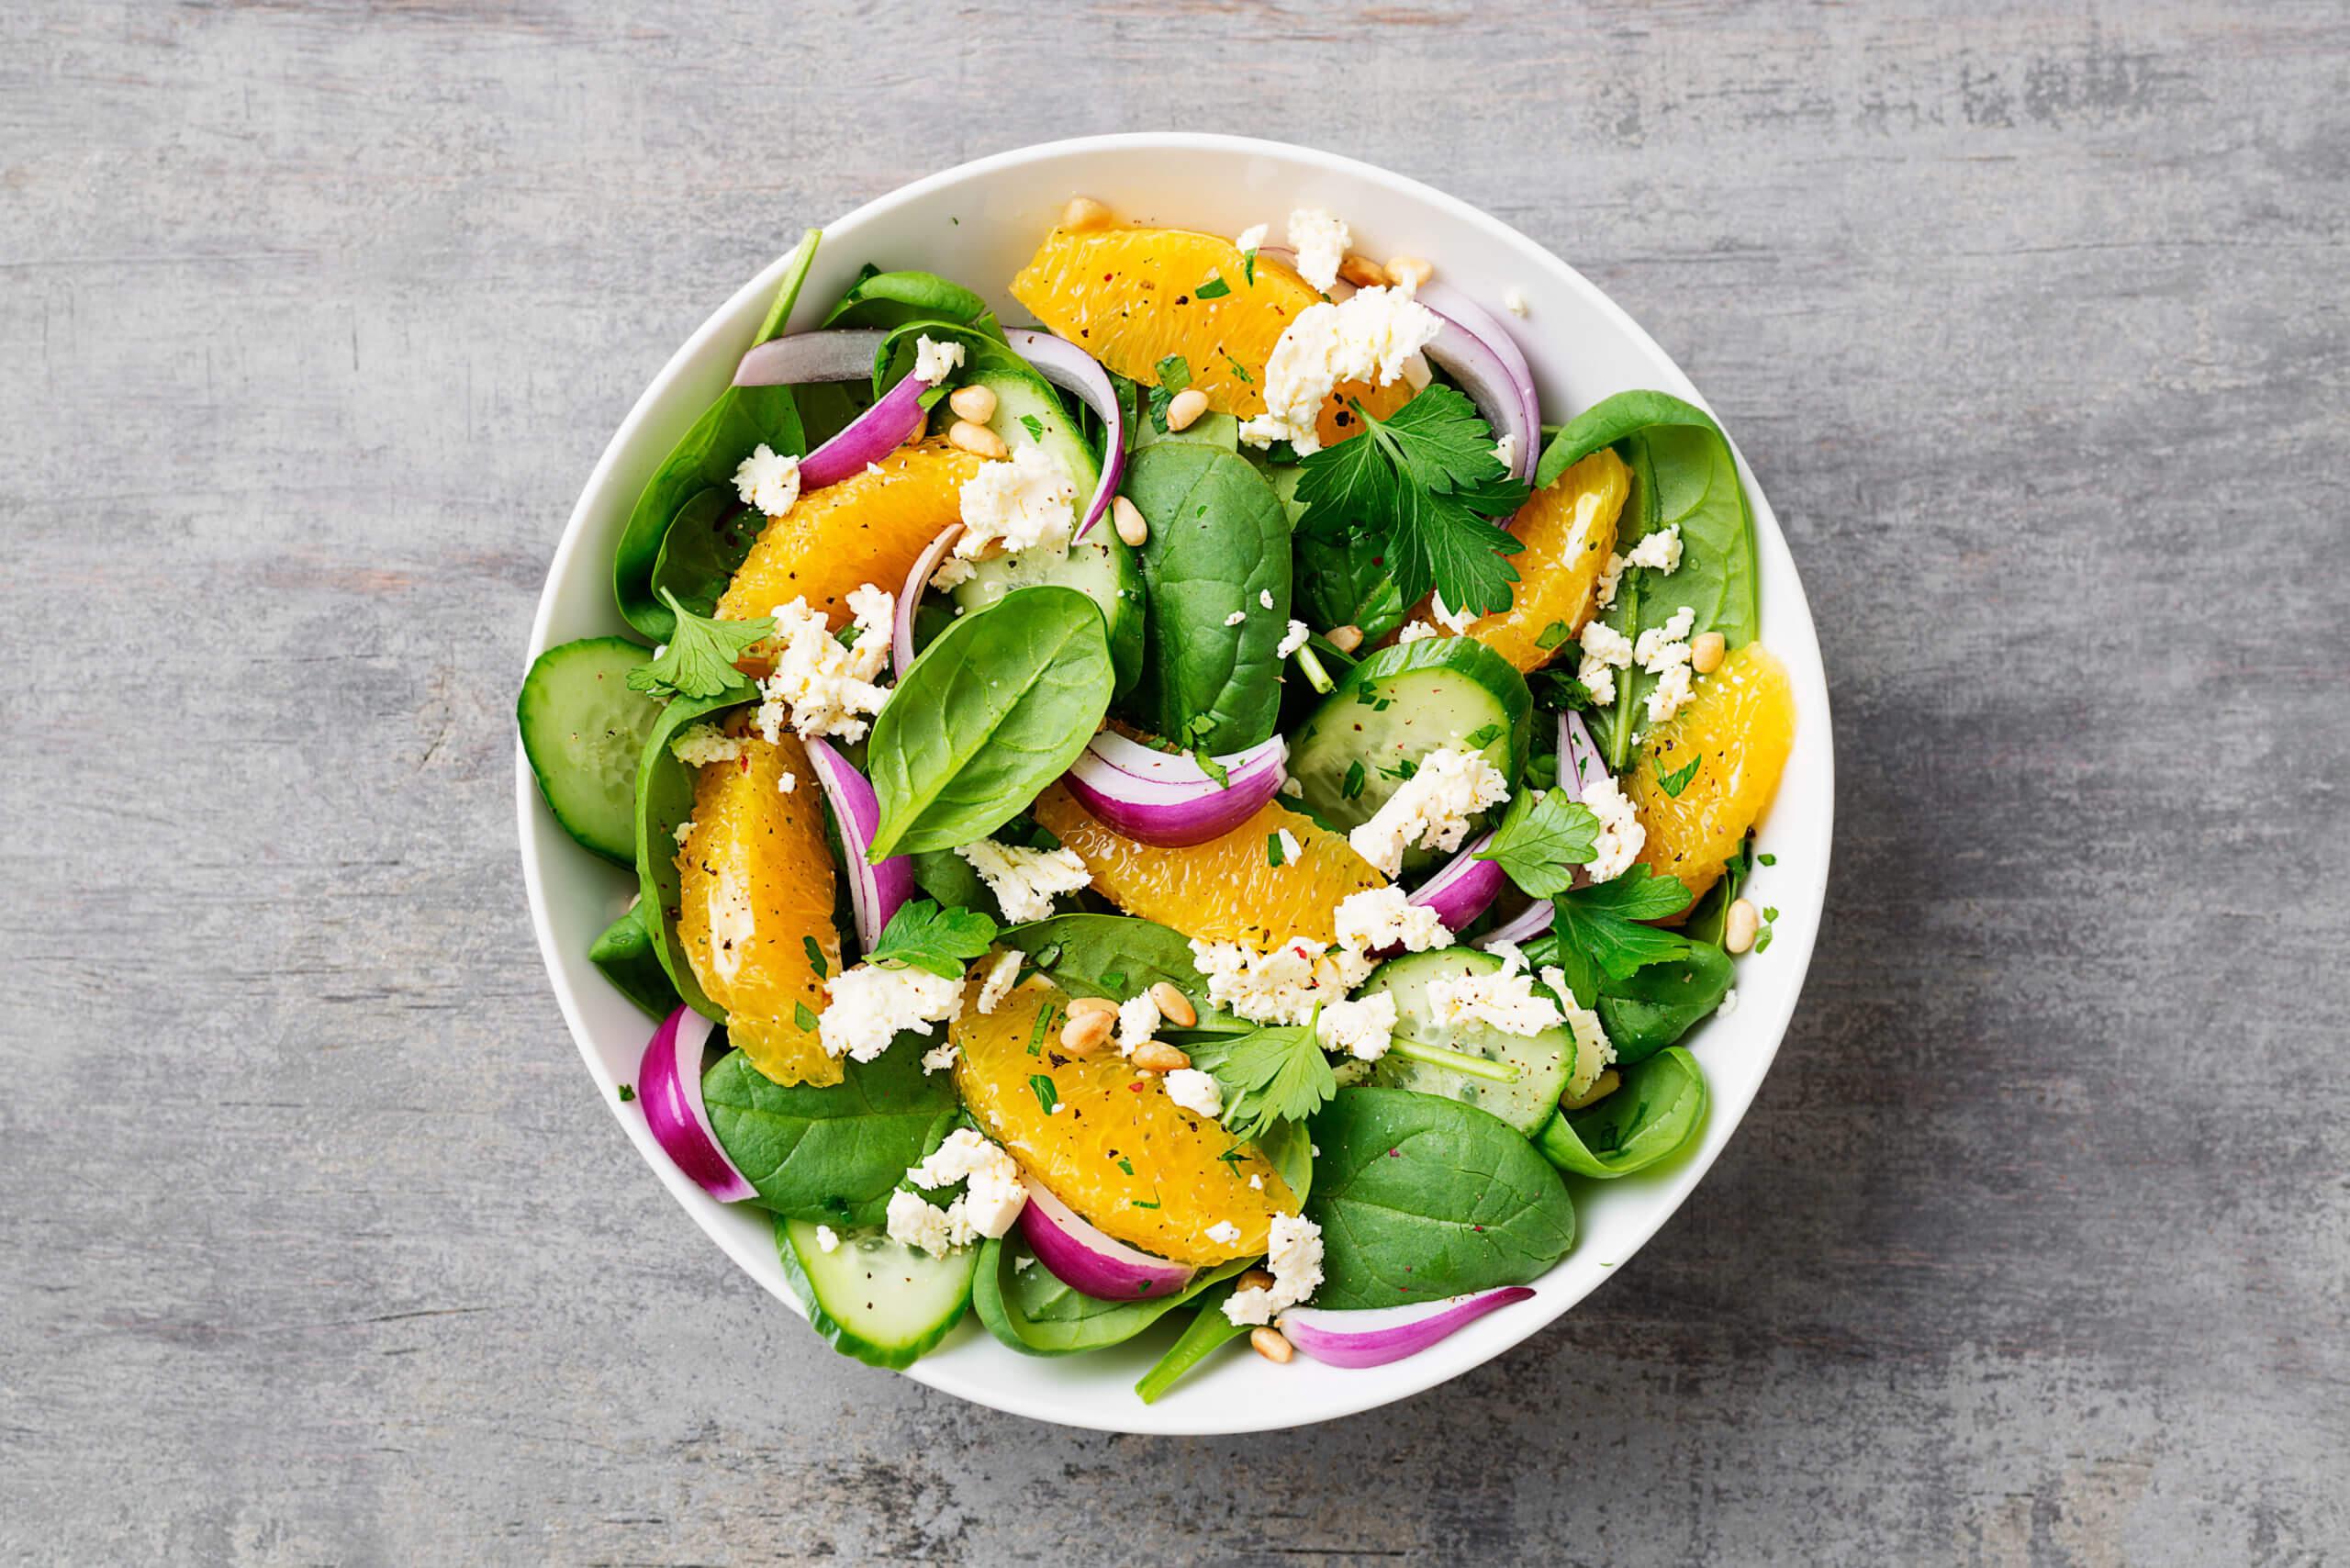 CBD Oil Summer Salad Recipe scaled